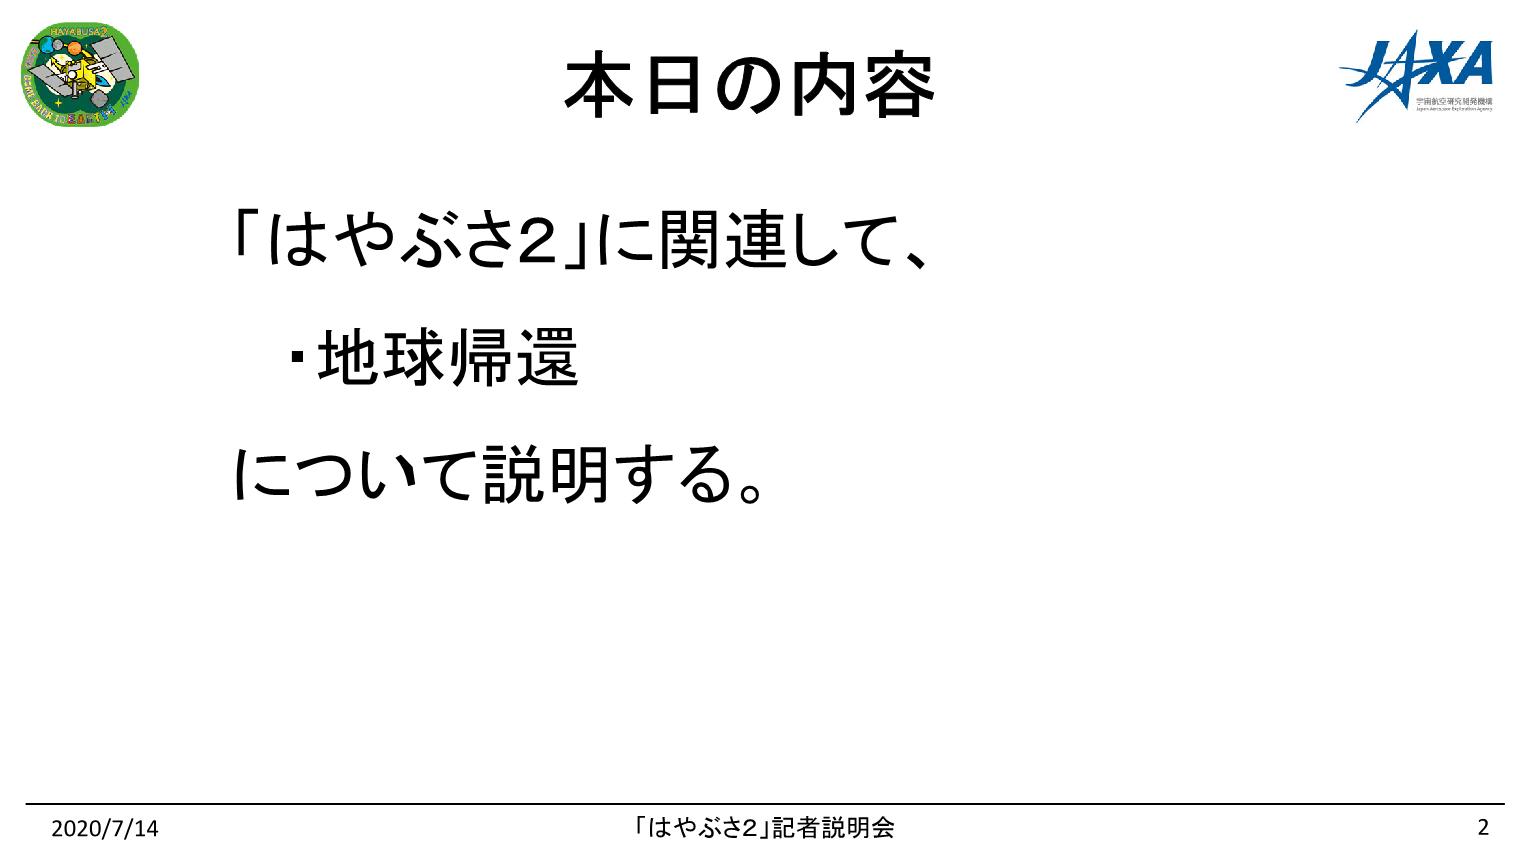 f:id:Imamura:20200714230217p:plain